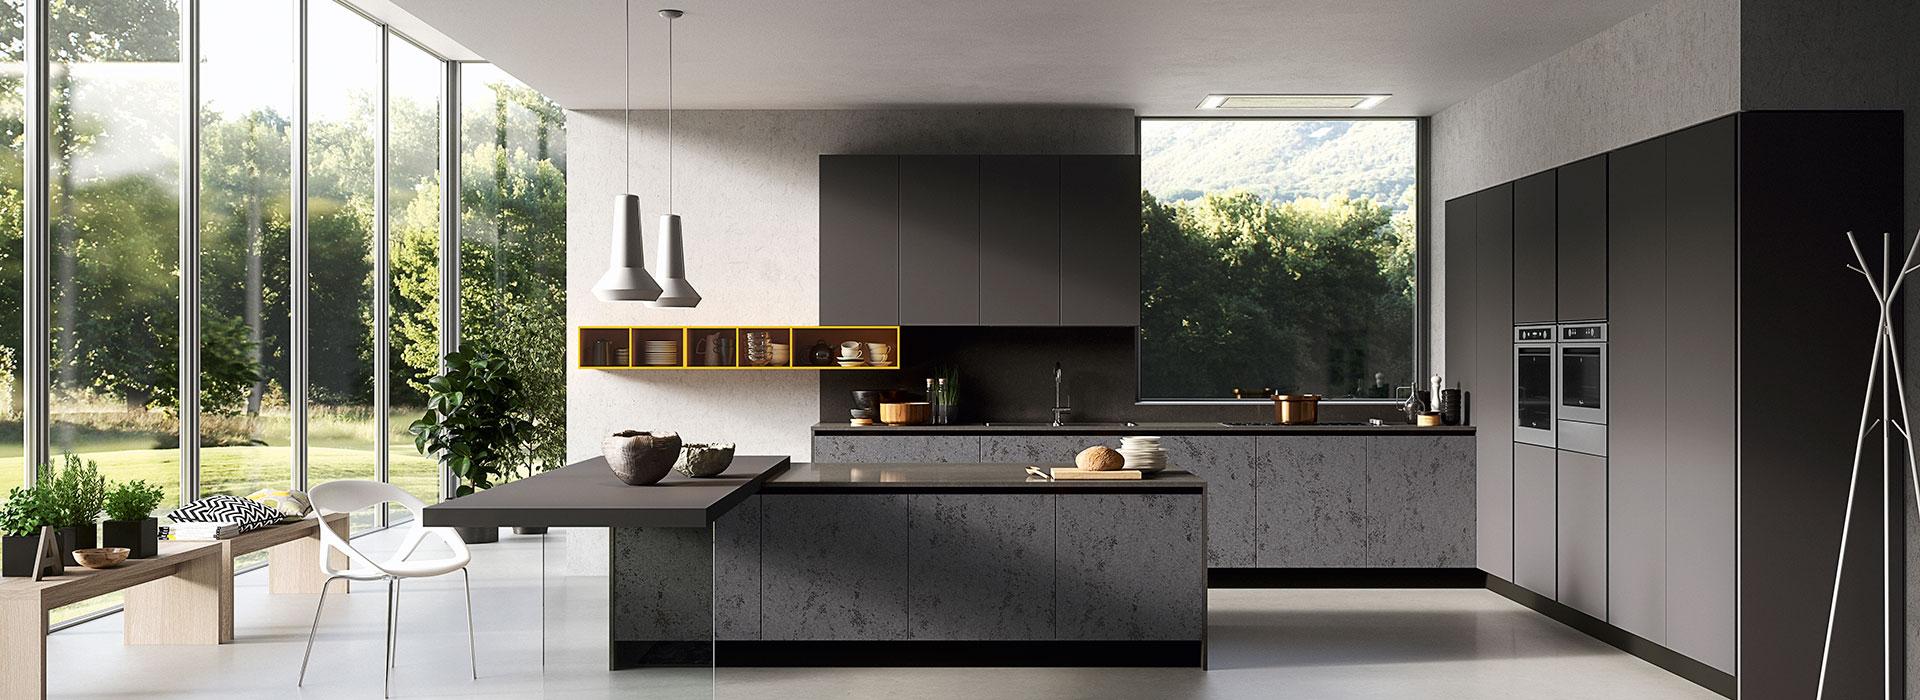 Arredamenti Gallomobili Mobili Udine - Cucine Moderne - Cucina Glass